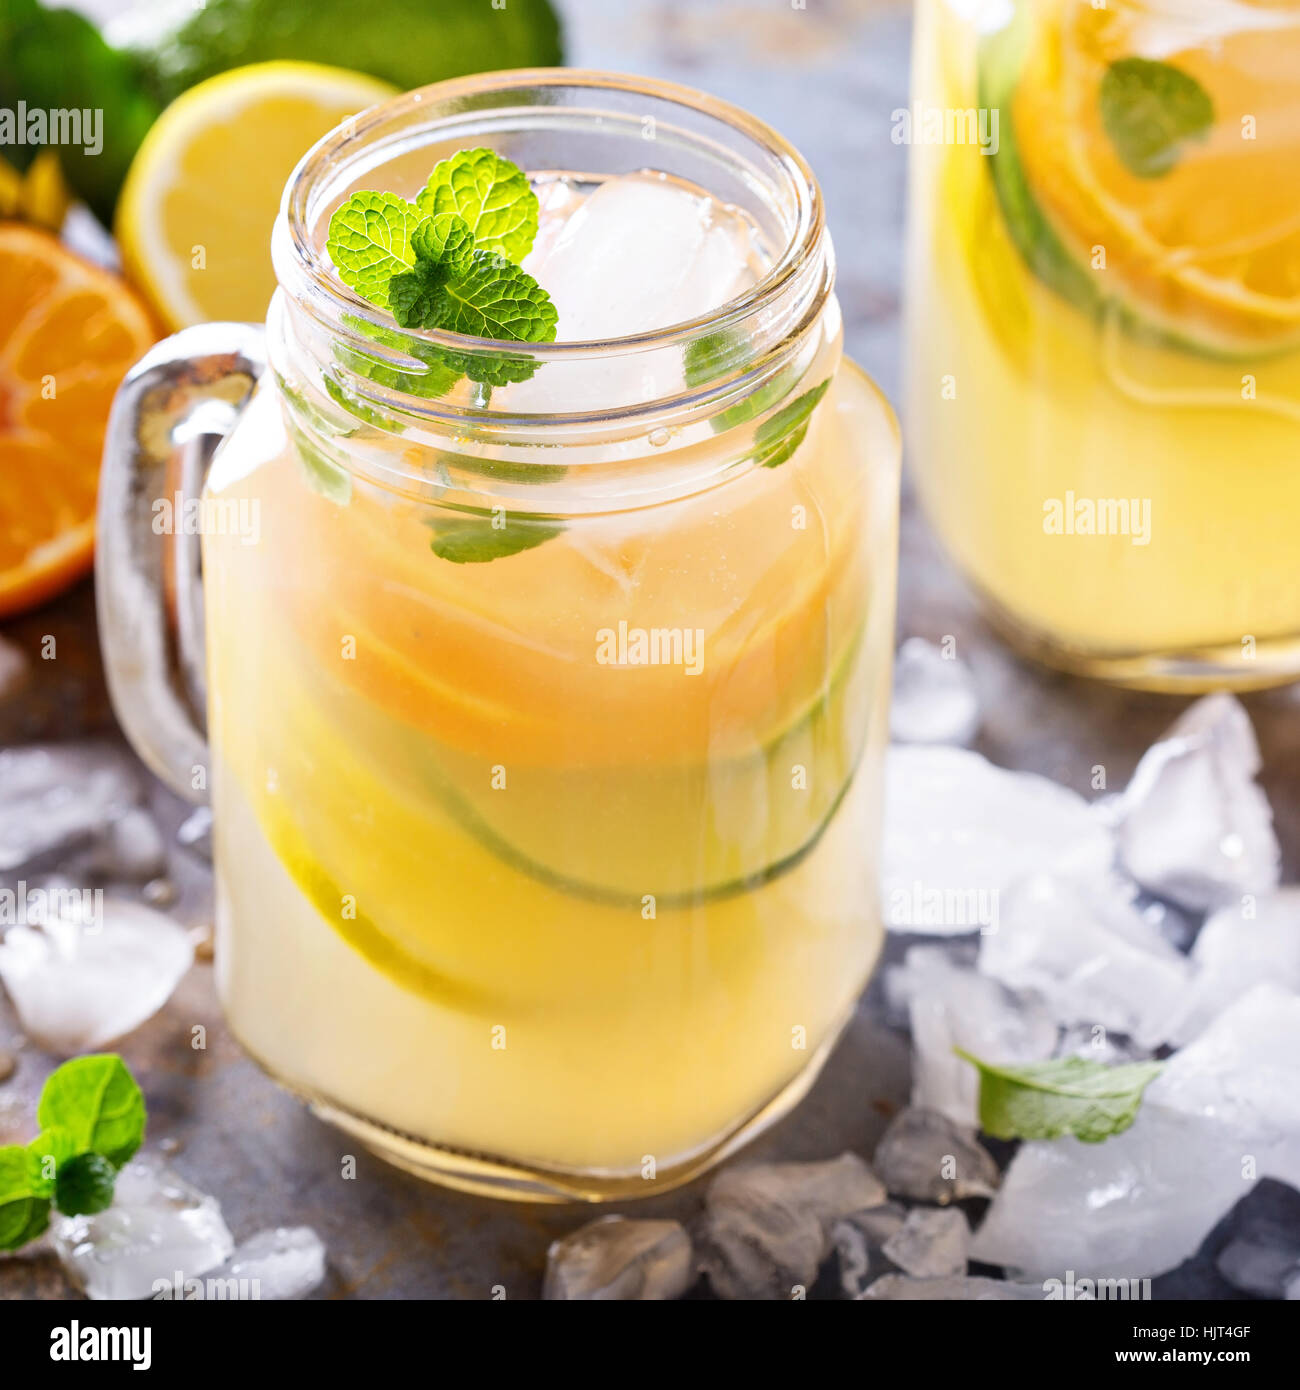 Citrus fruit lemonade in mason jars - Stock Image